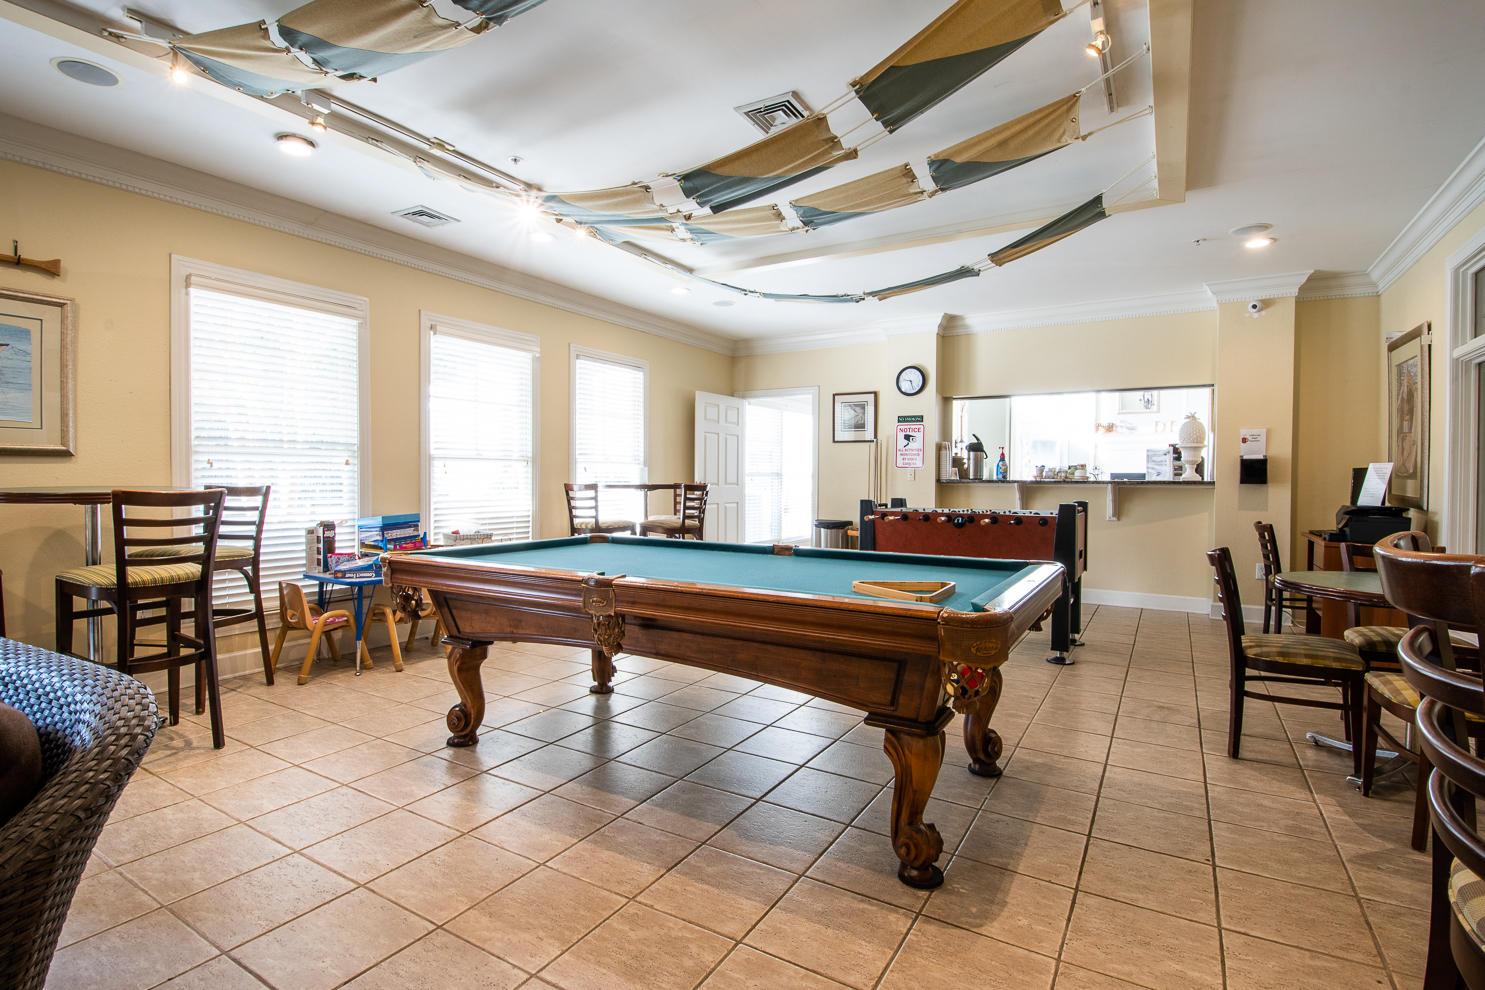 Daniel Landing Condos Homes For Sale - 130 River Landing, Charleston, SC - 0